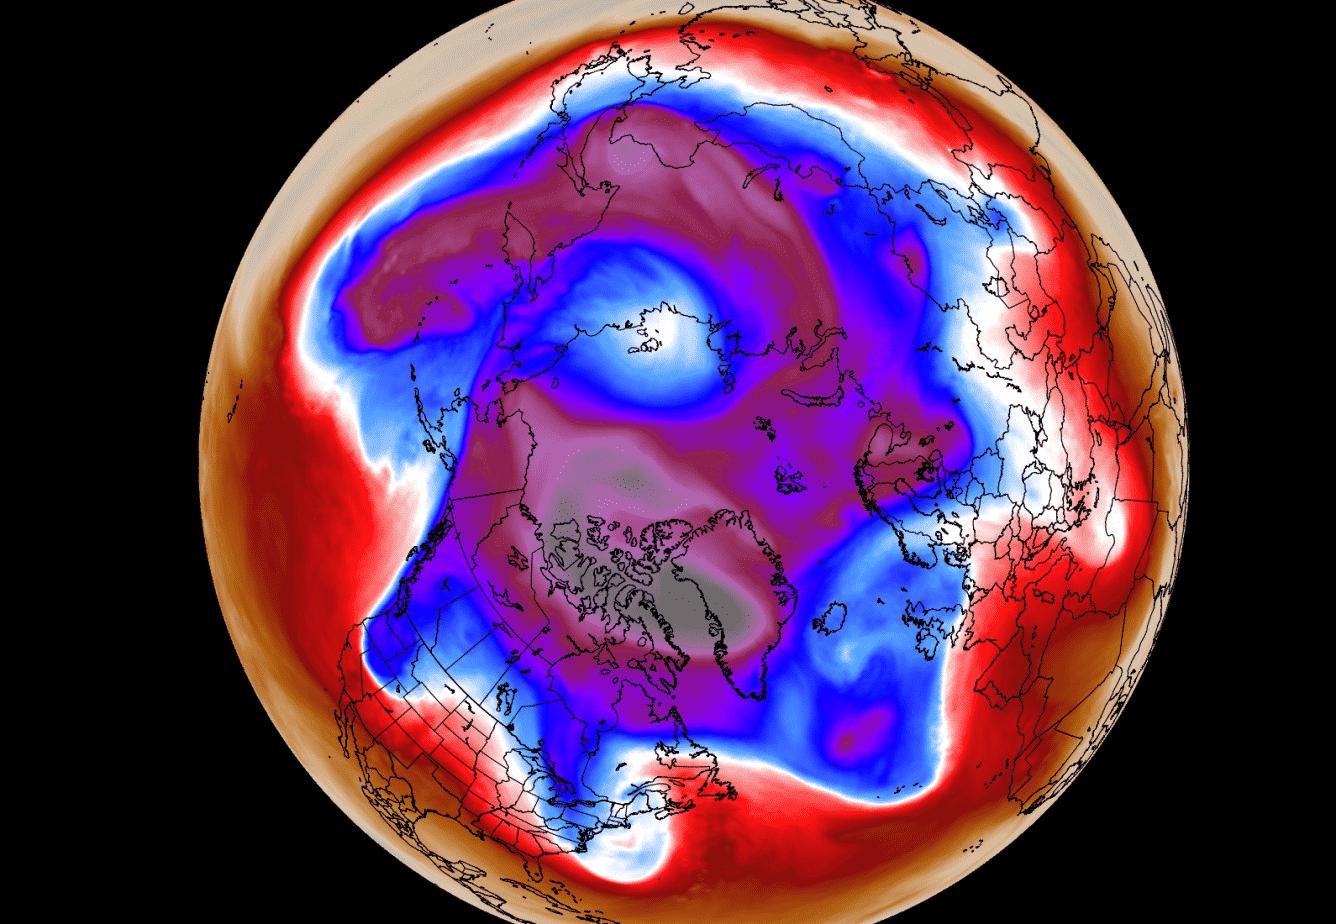 polar-vortex-weather-winter-united-states-europe-north-hemisphere-cyclone